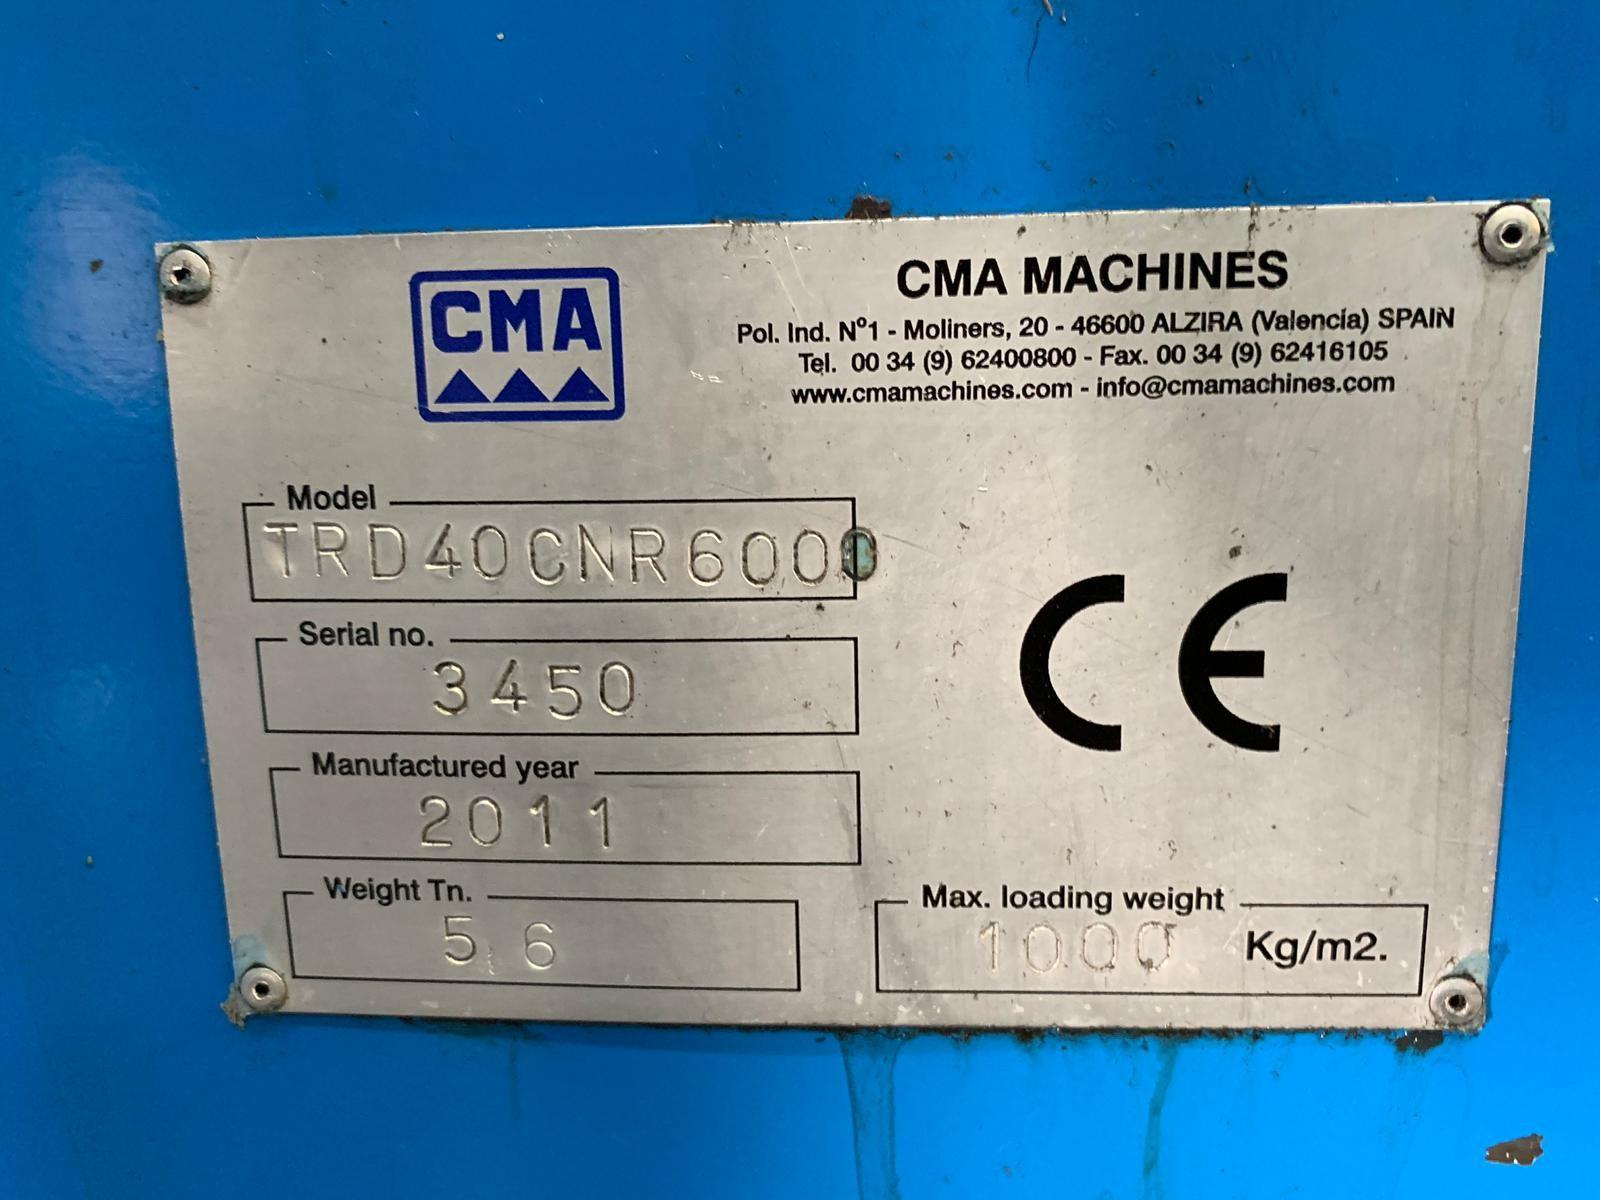 CMA TRD 40 CNR 6000 3